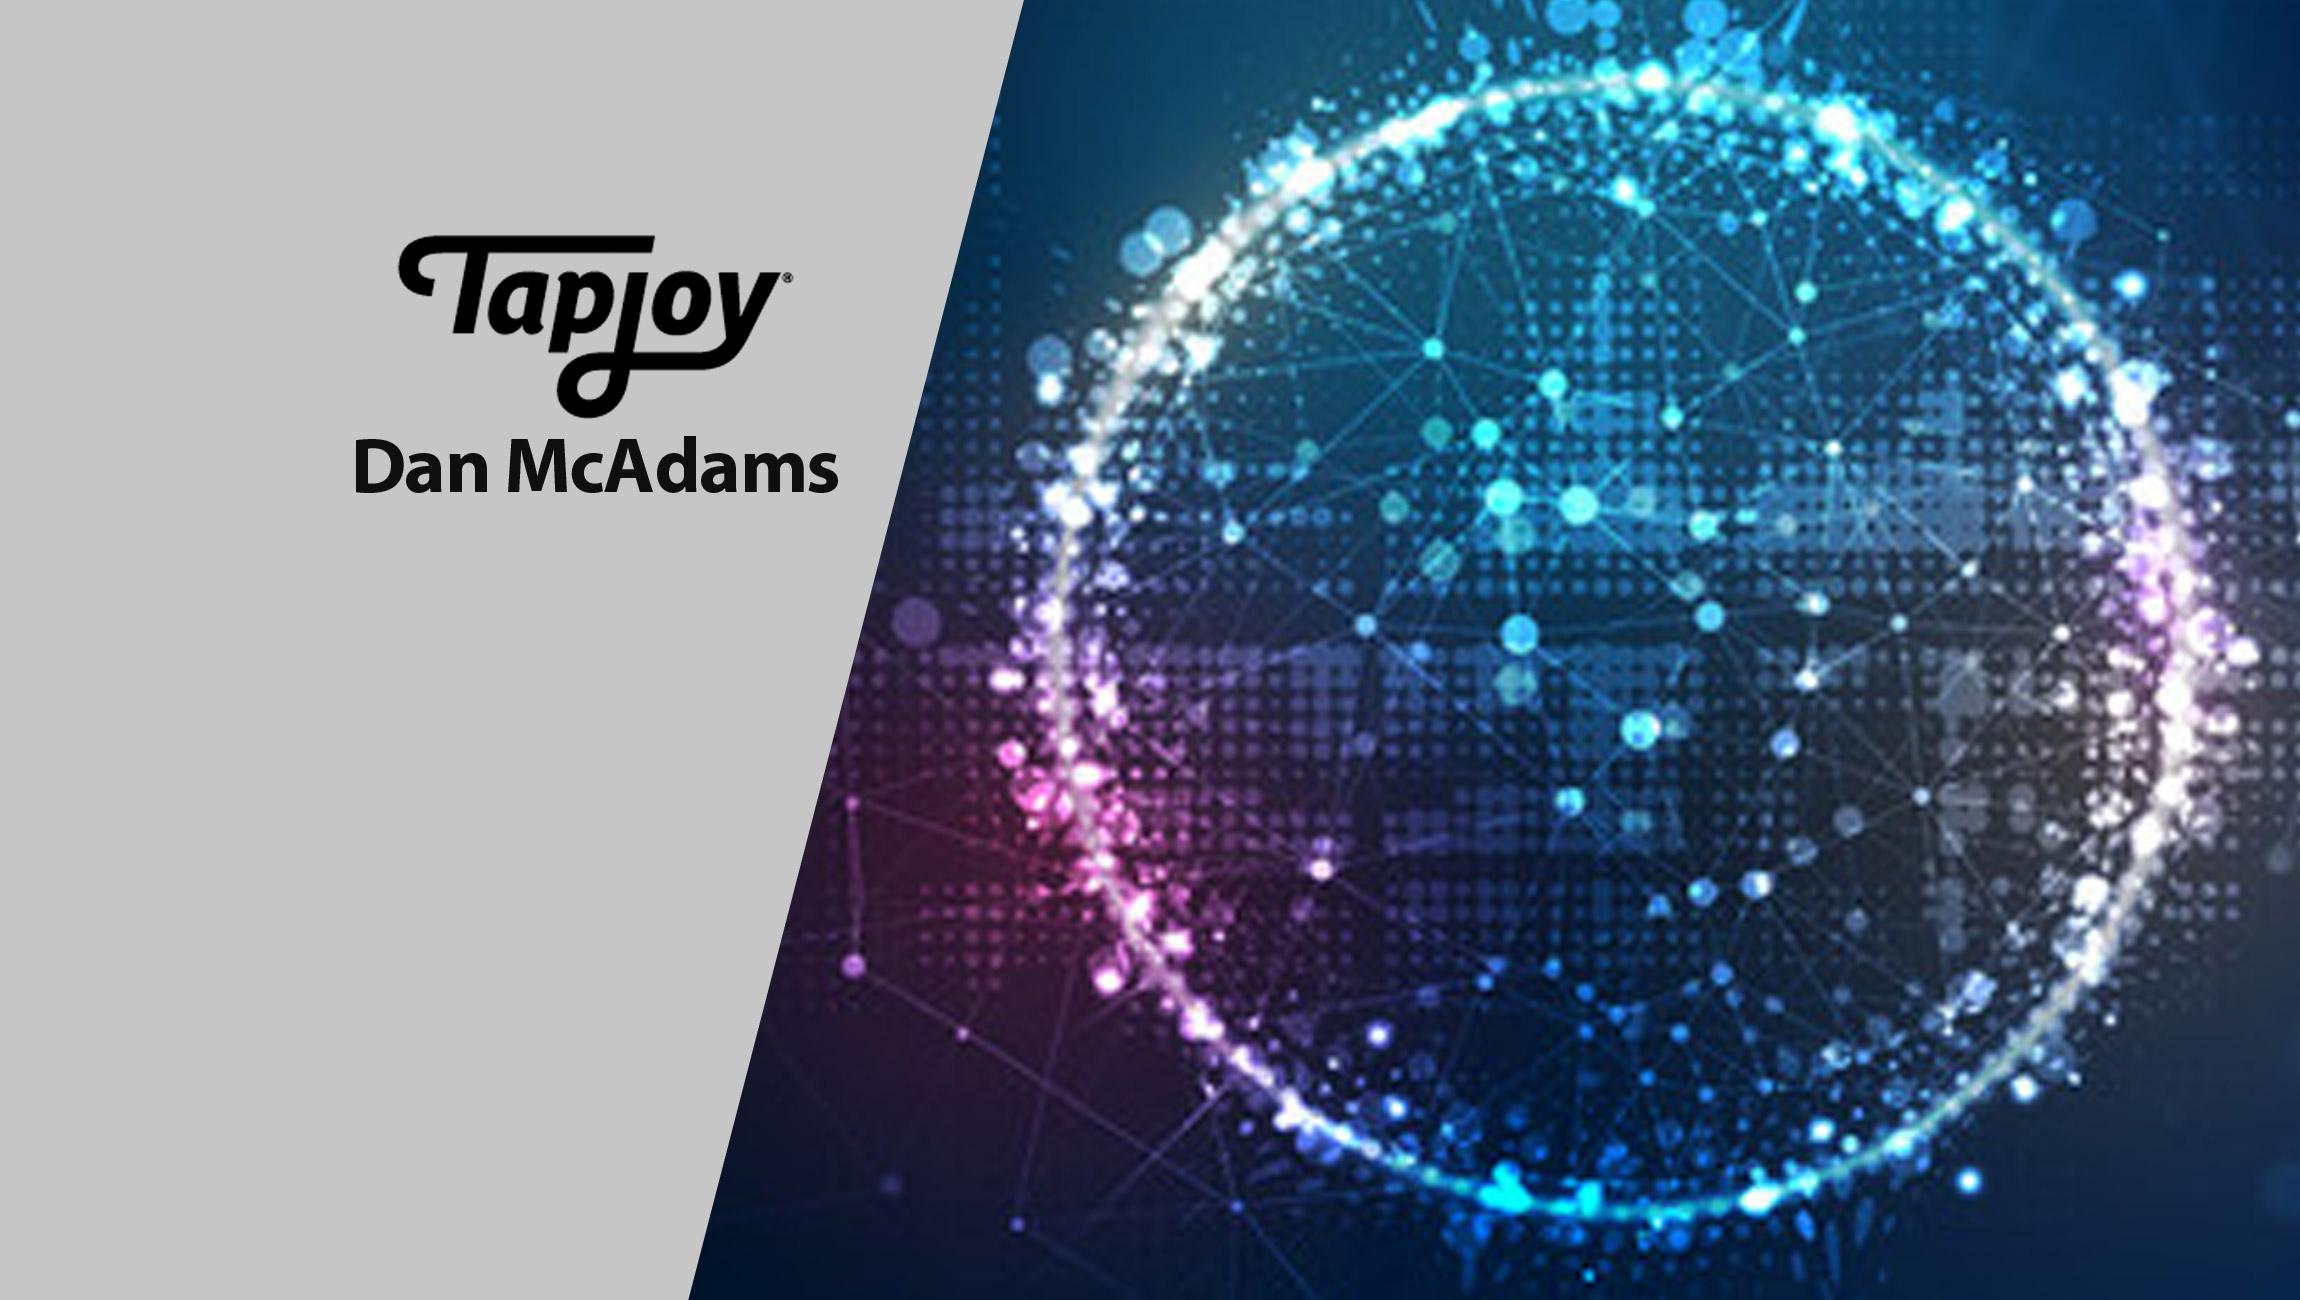 MarTech Interview with Dan McAdams, Sr. Director, Developer Relations at Tapjoy